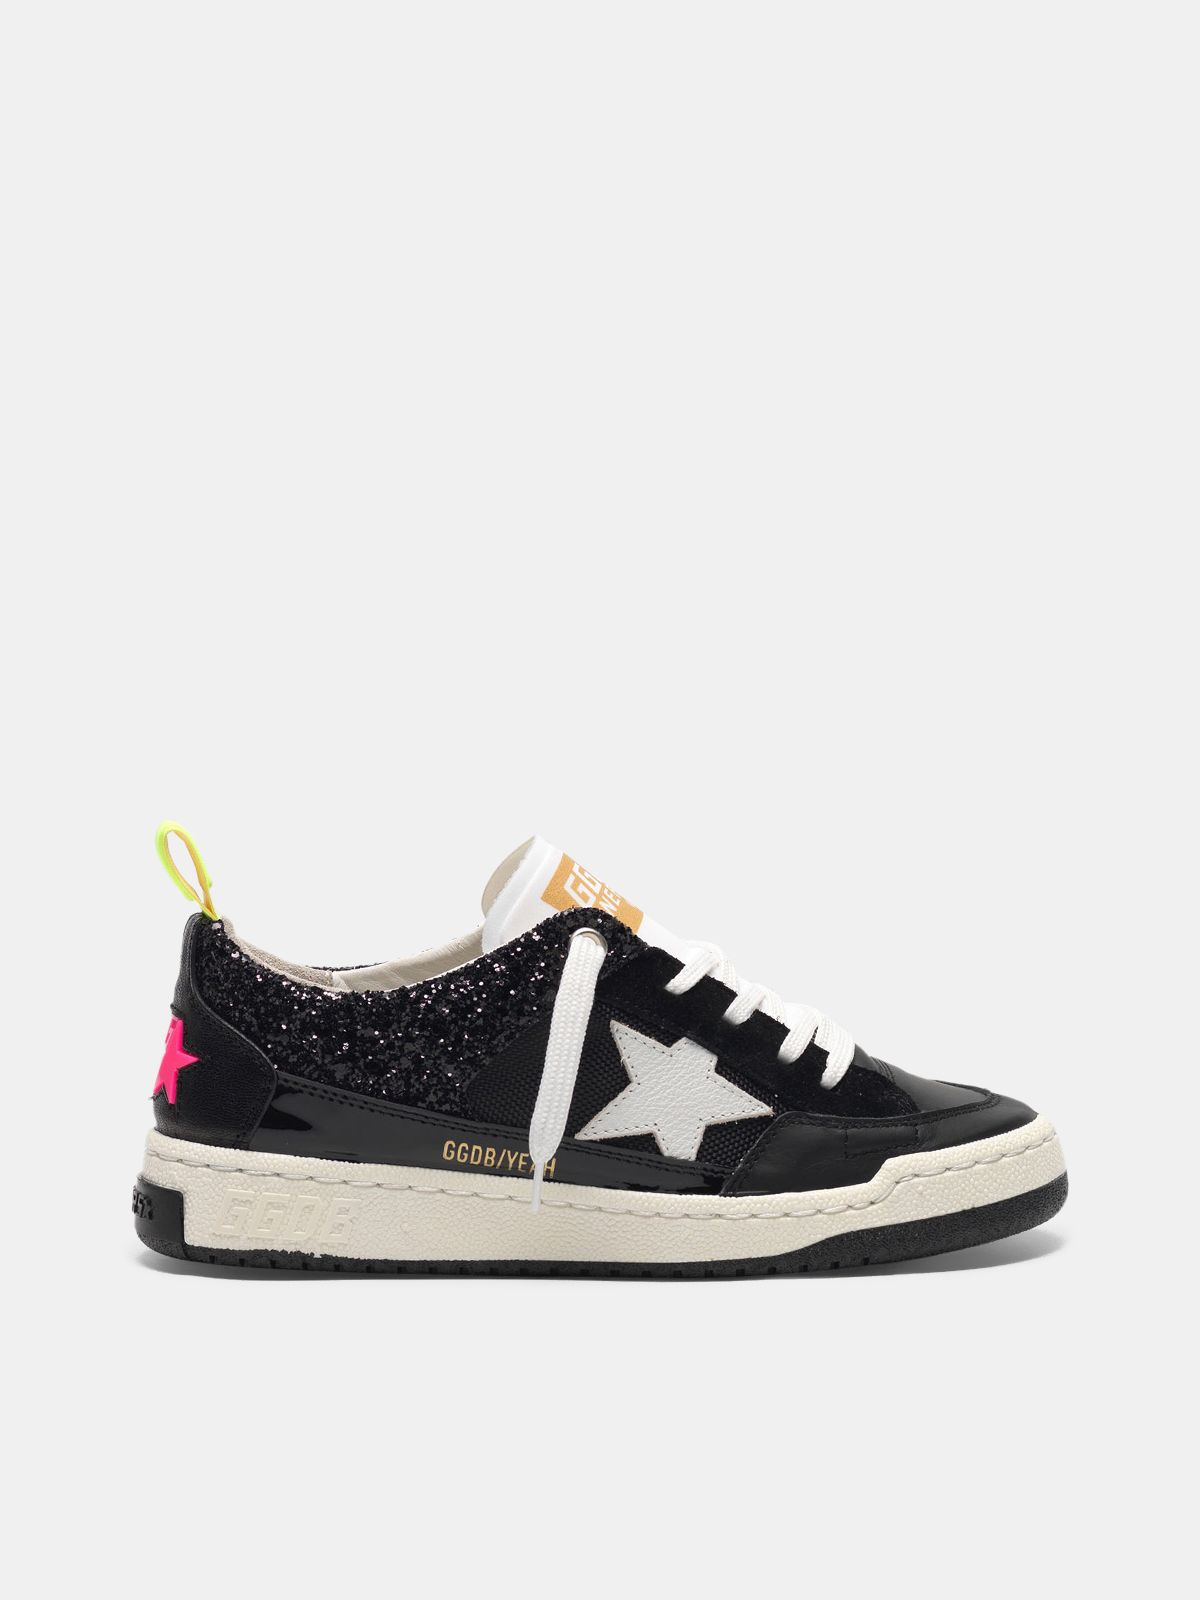 Golden Goose - Sneakers Yeah! nere con stella bianca in